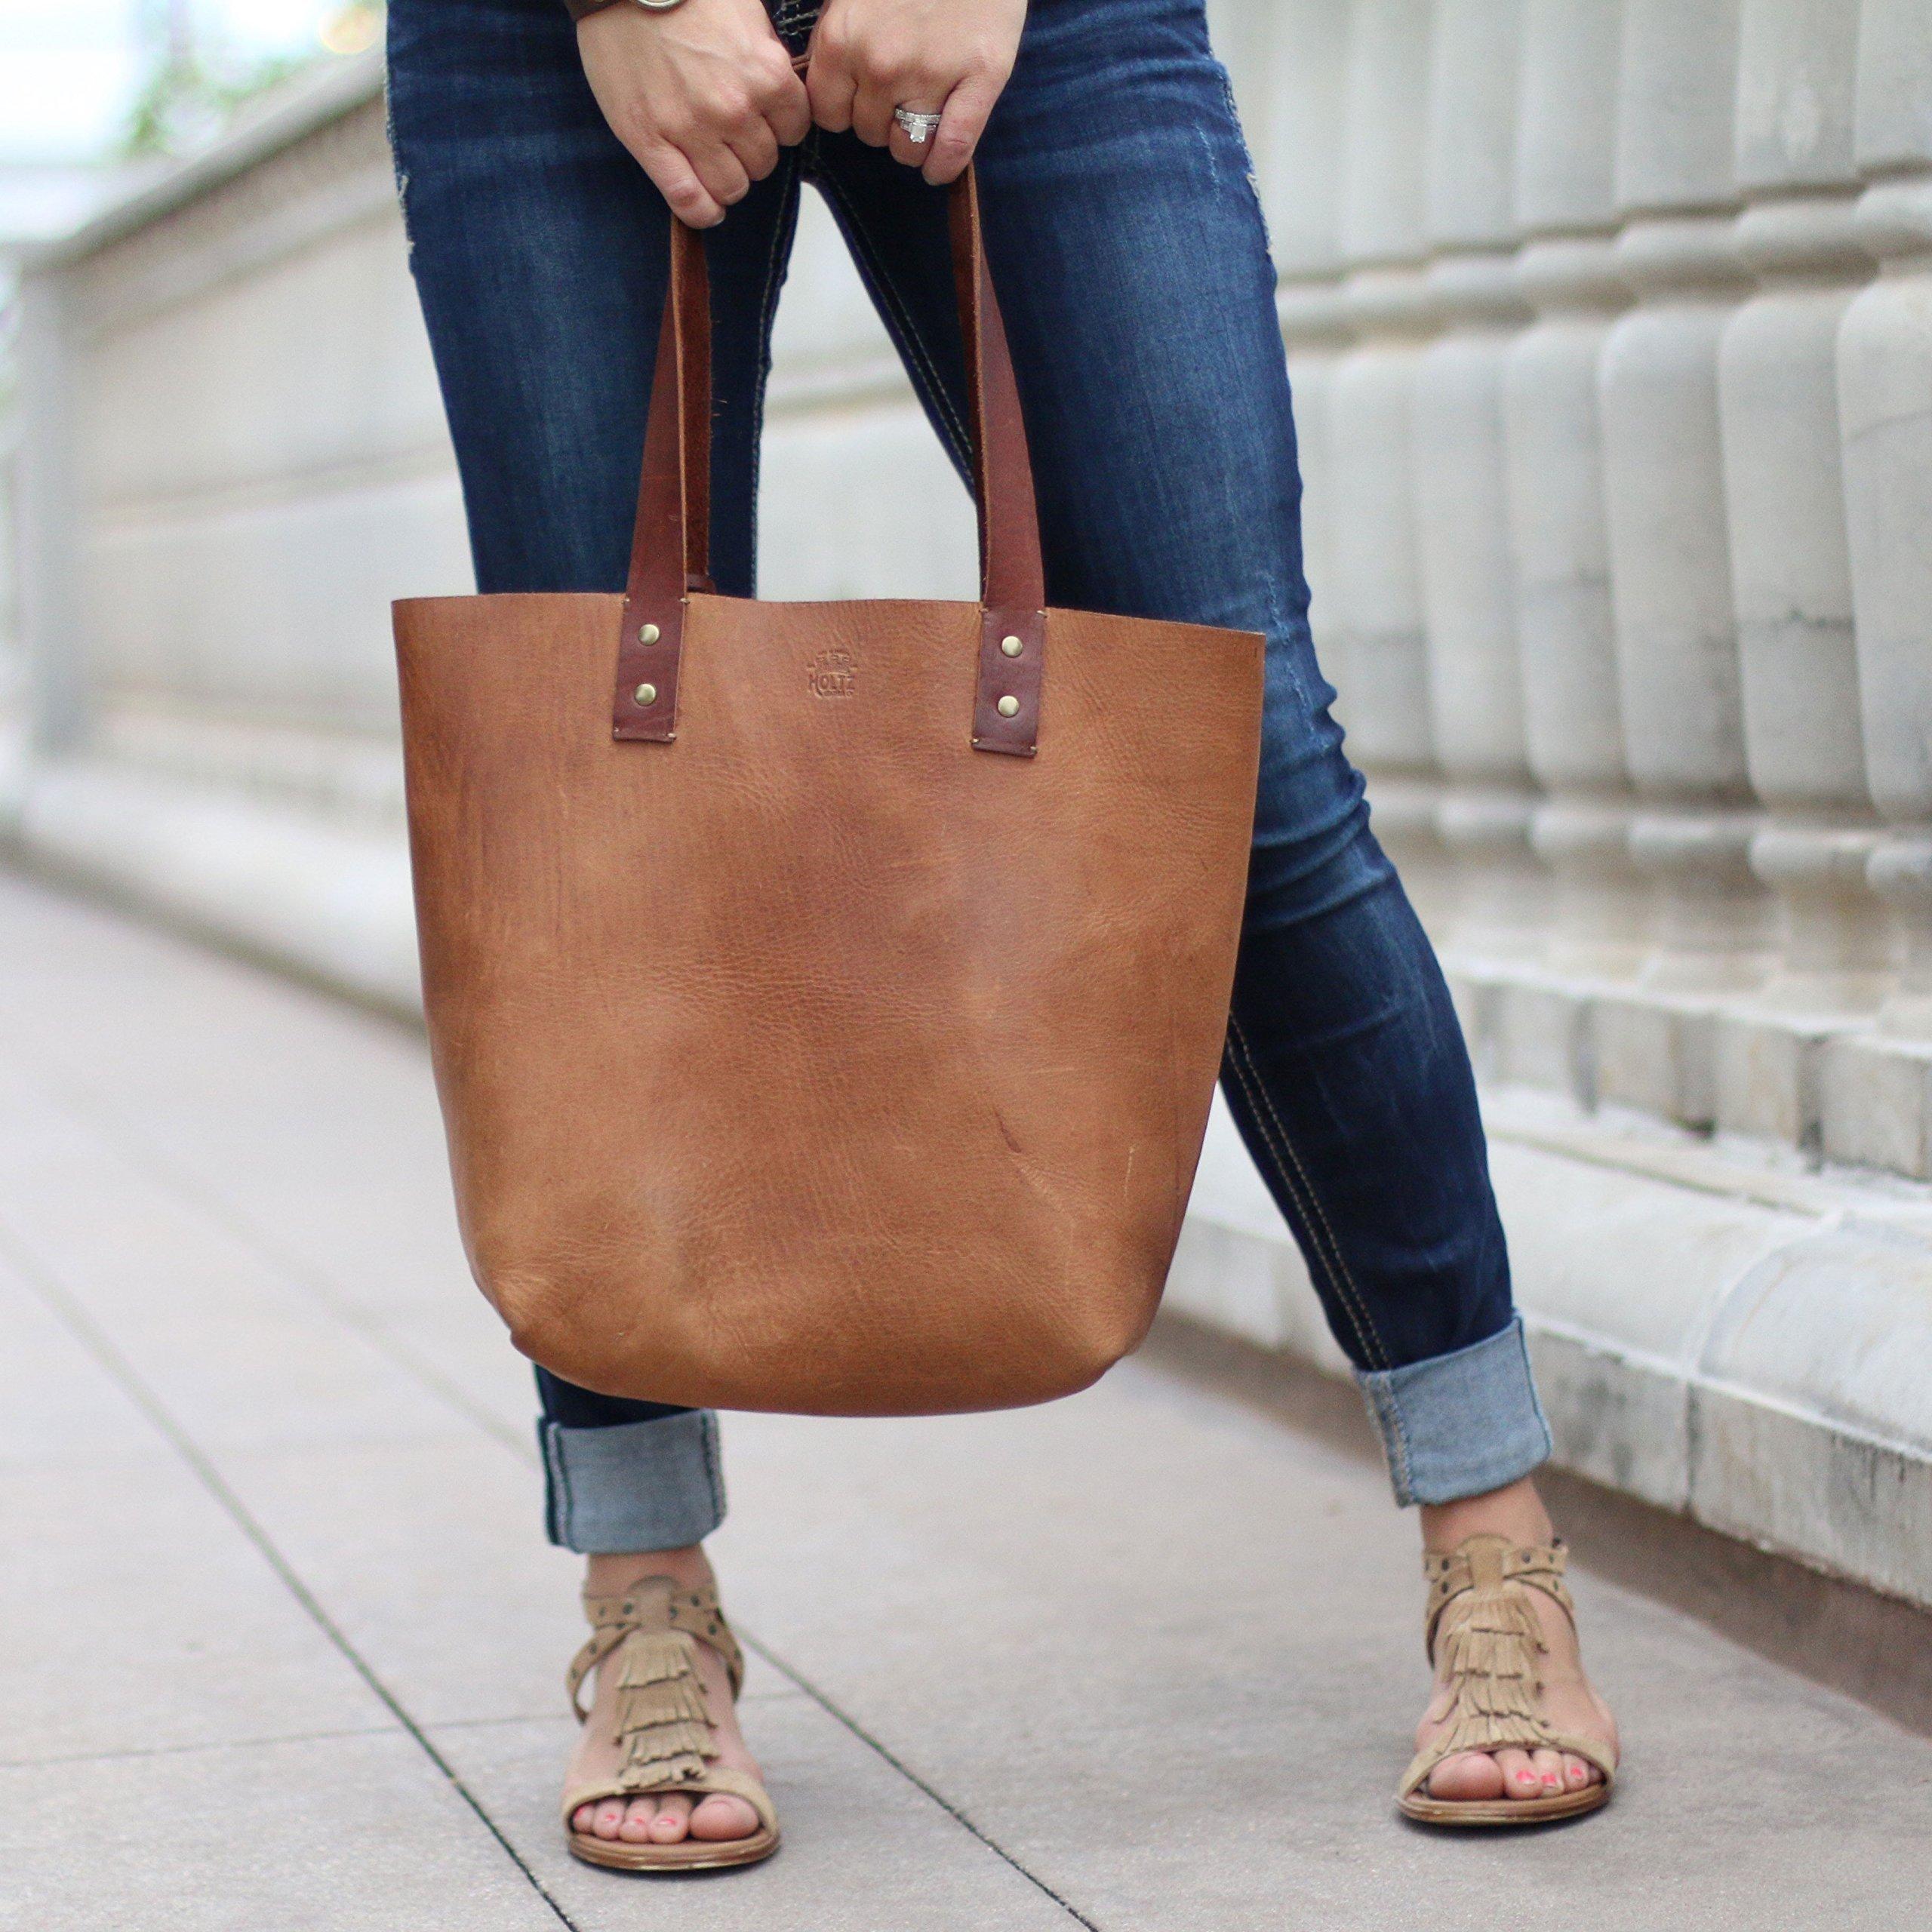 The Ashley Tote Fine Leather Handbag Purse Bag